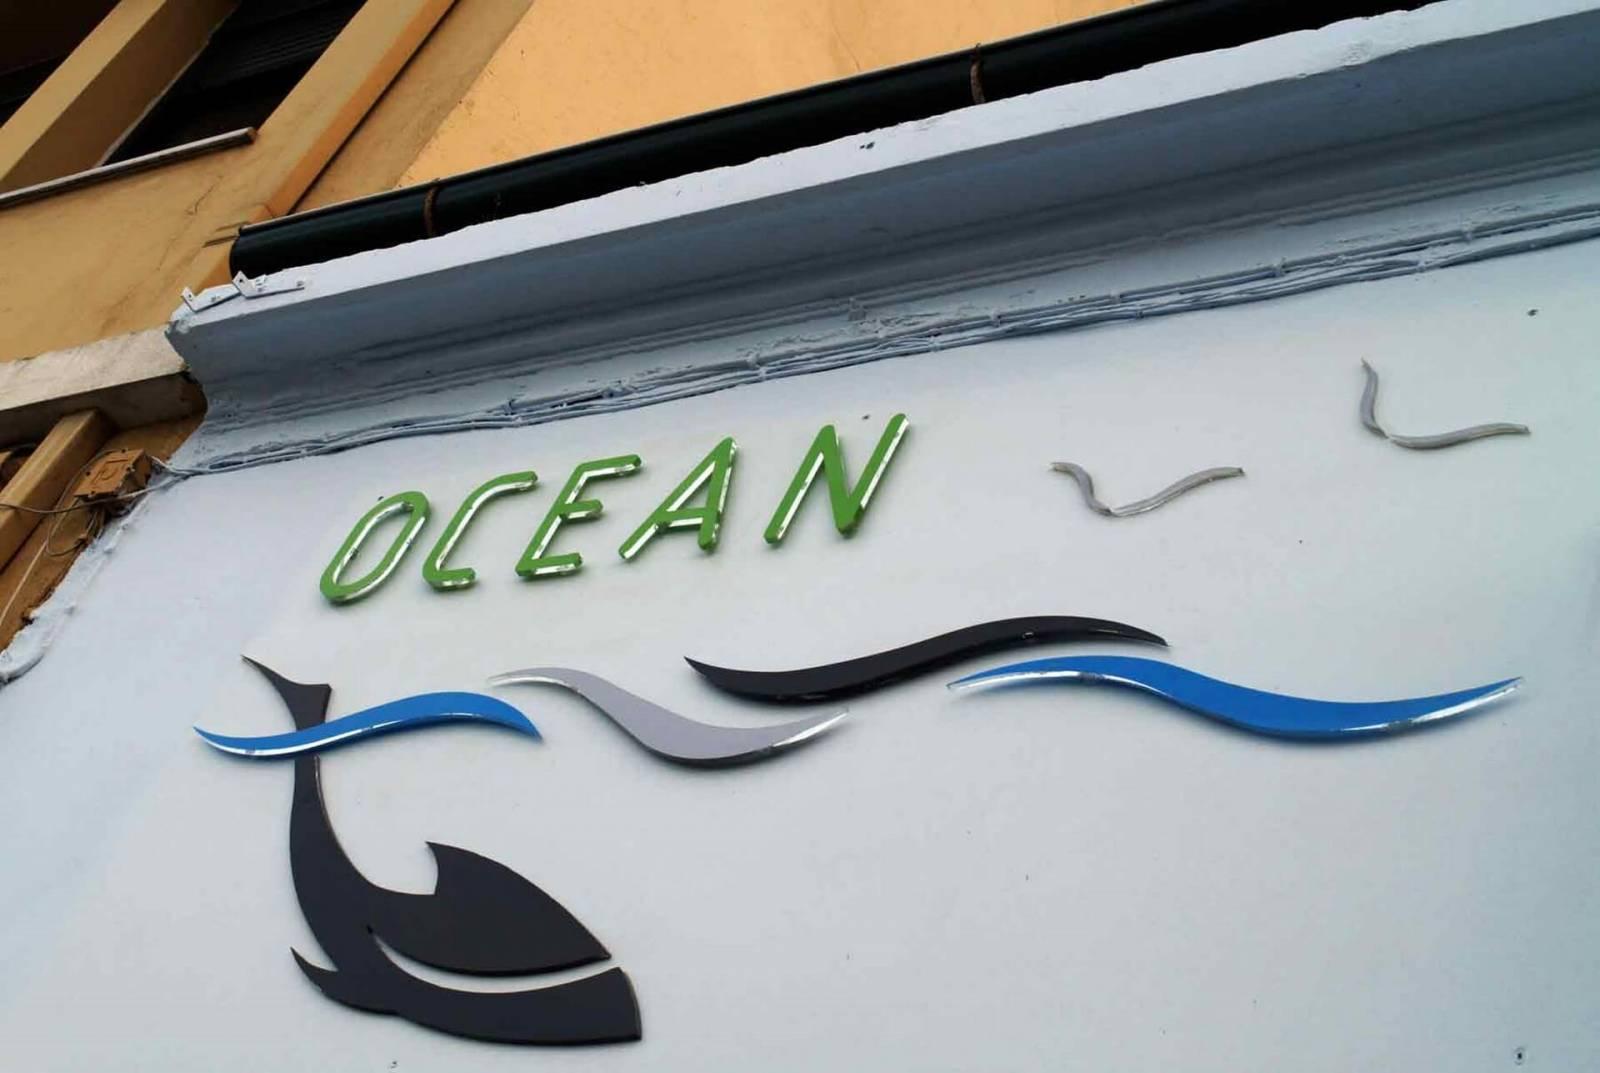 Ocean - 14